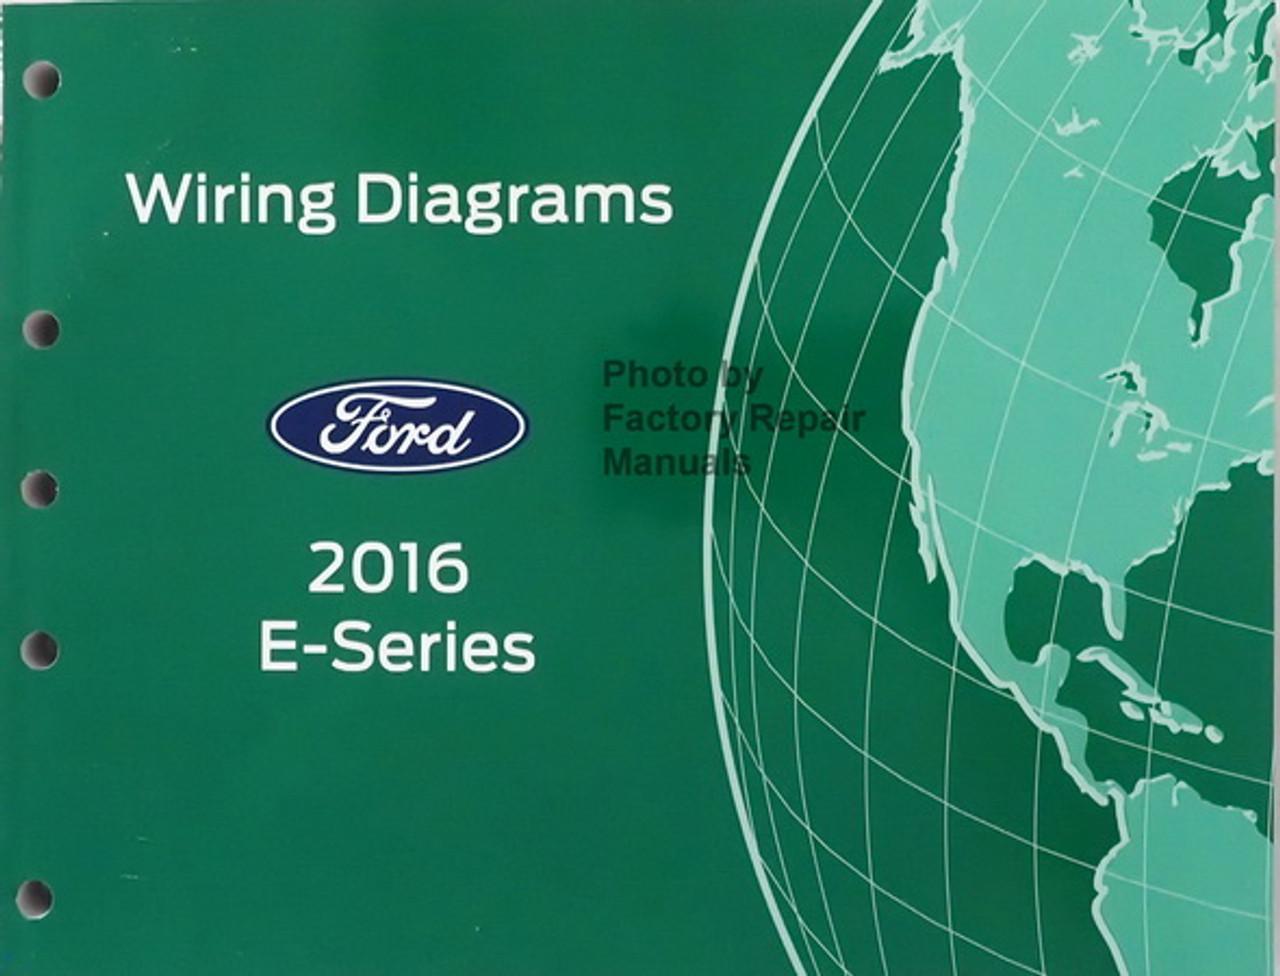 2016 Ford E350 E450 Electrical Wiring Diagrams Manual Original - Factory  Repair ManualsFactory Repair Manuals